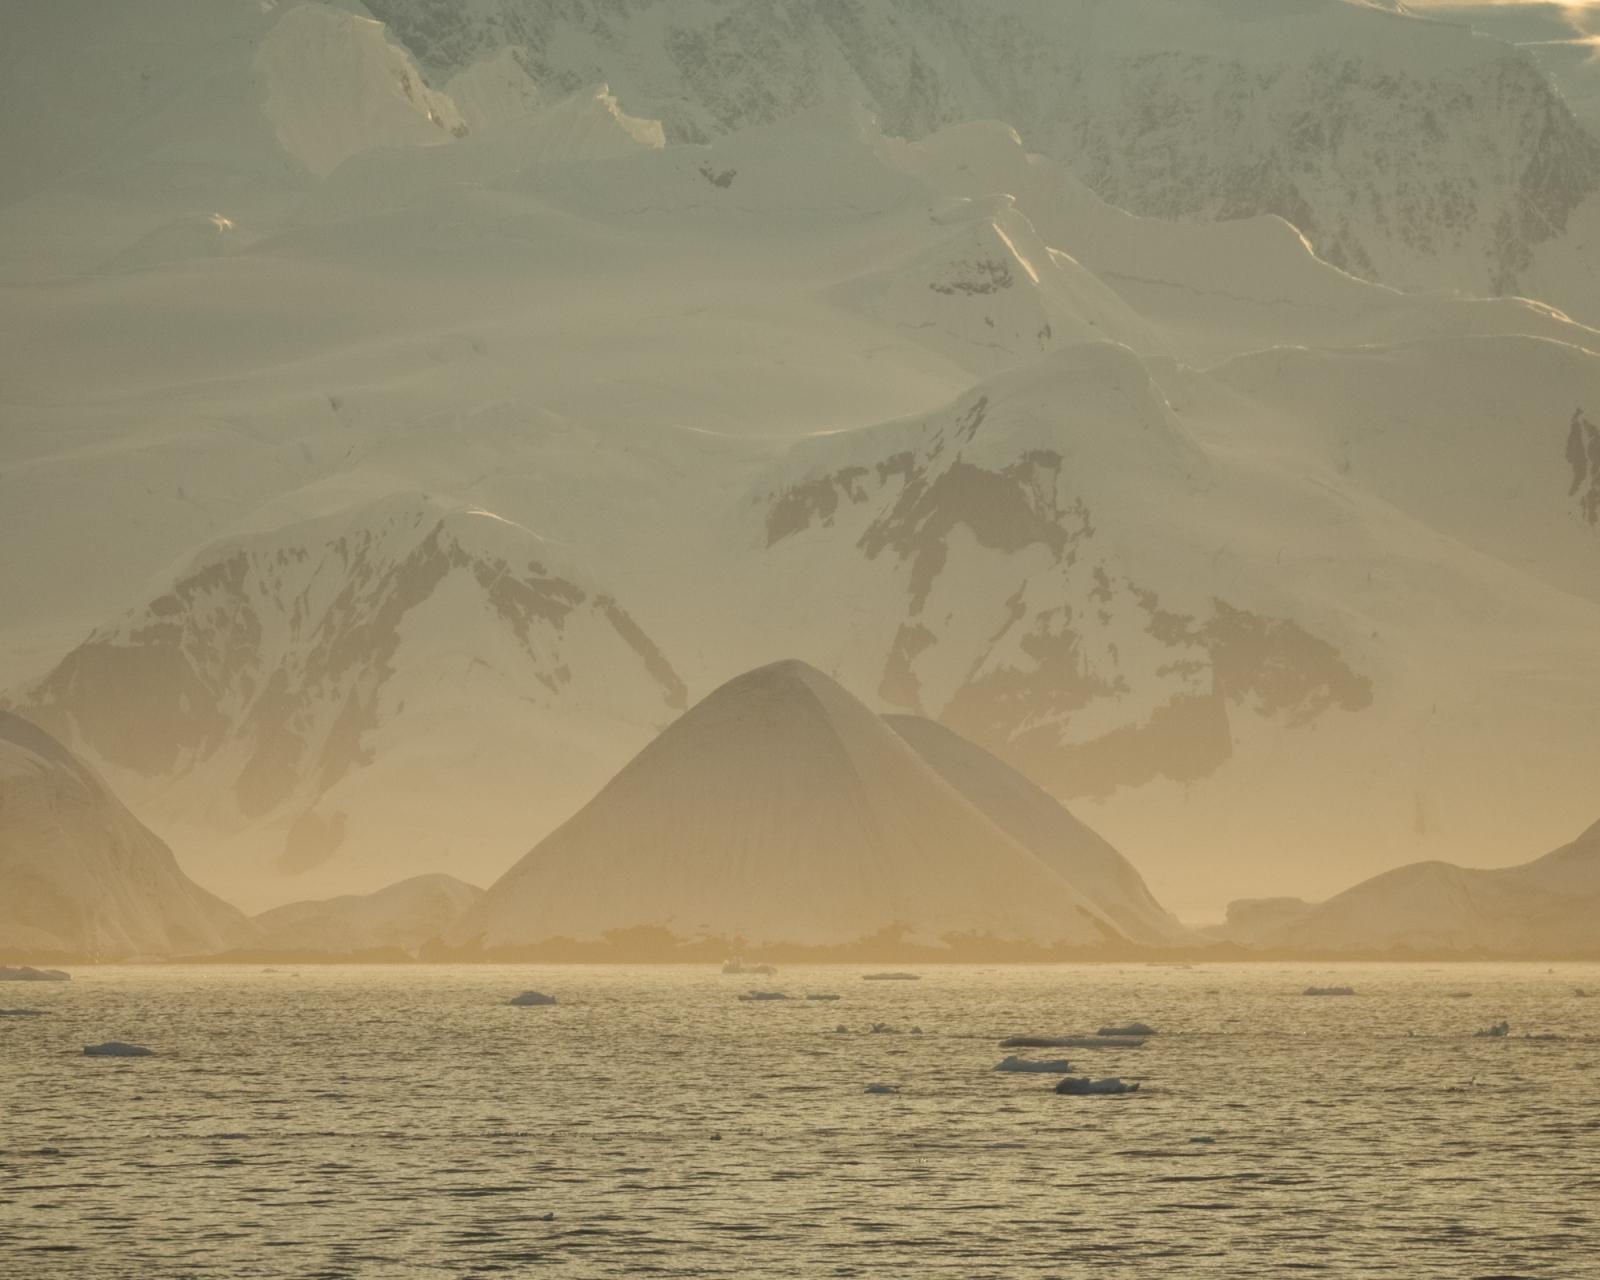 Art and Documentary Photography - Loading 0_Antarctica_UPLOAD_acaciajohnson_27.jpg